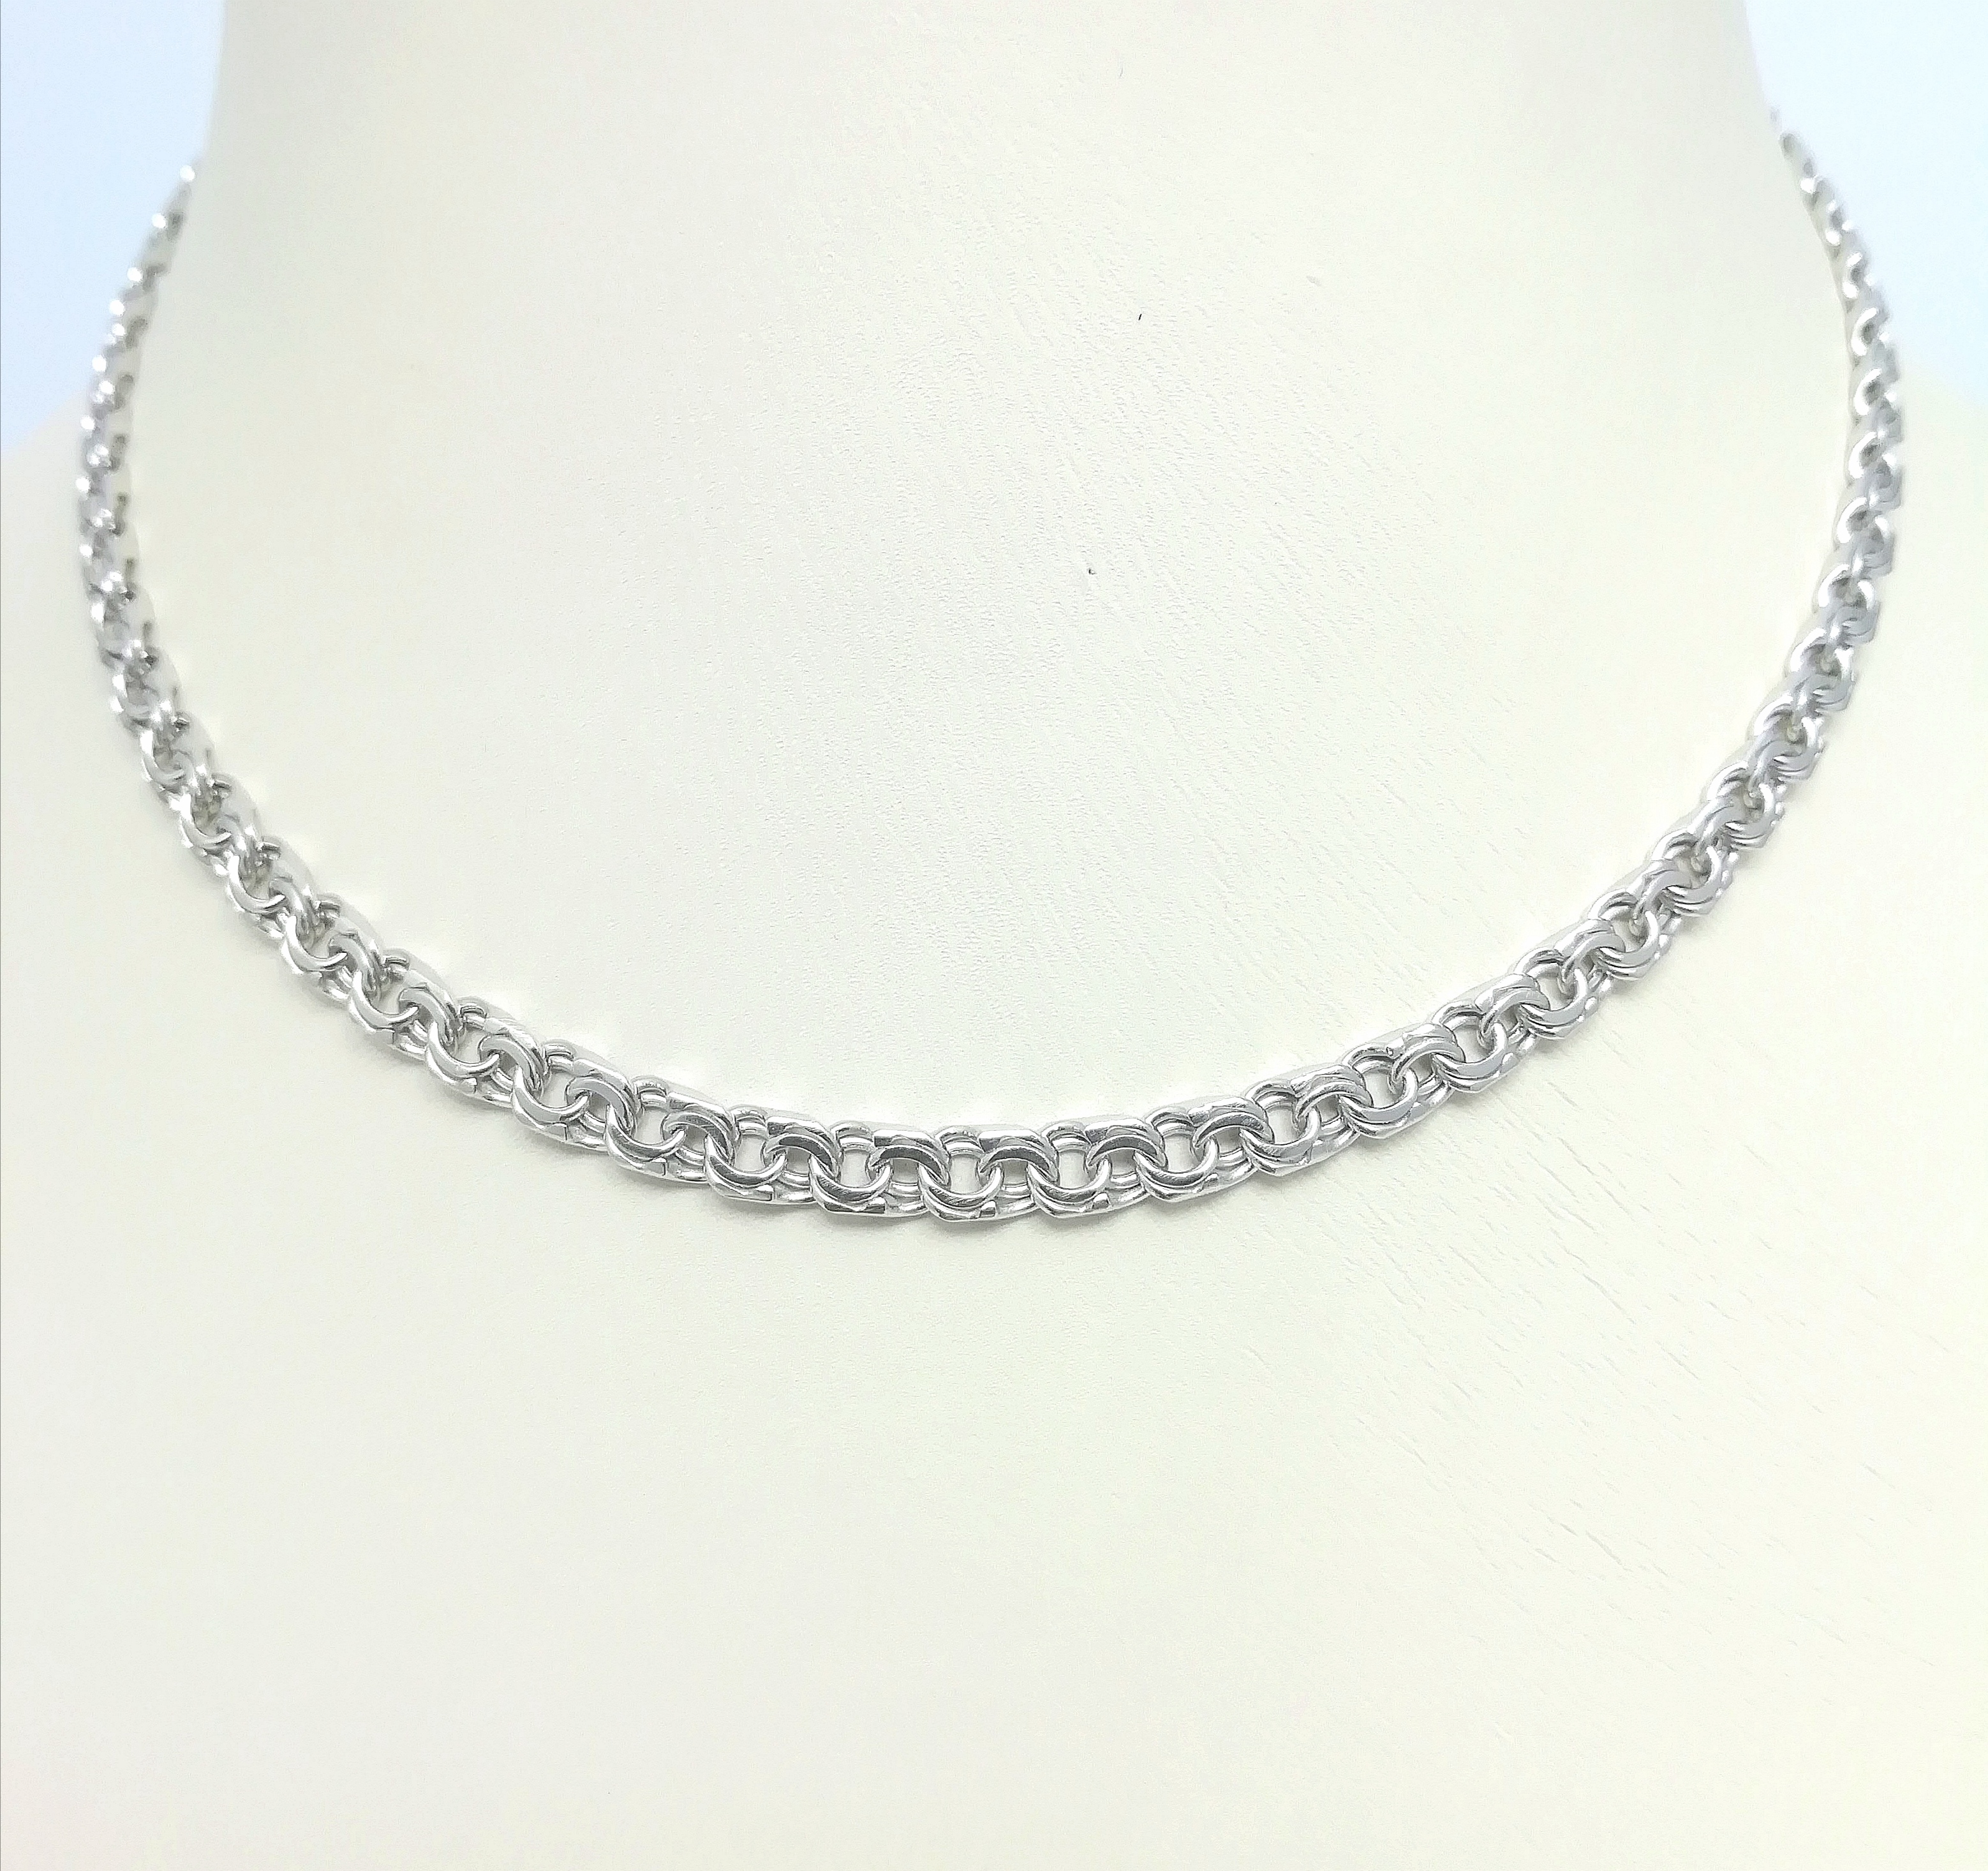 Серебро цепь дк240920-78 16,50гр